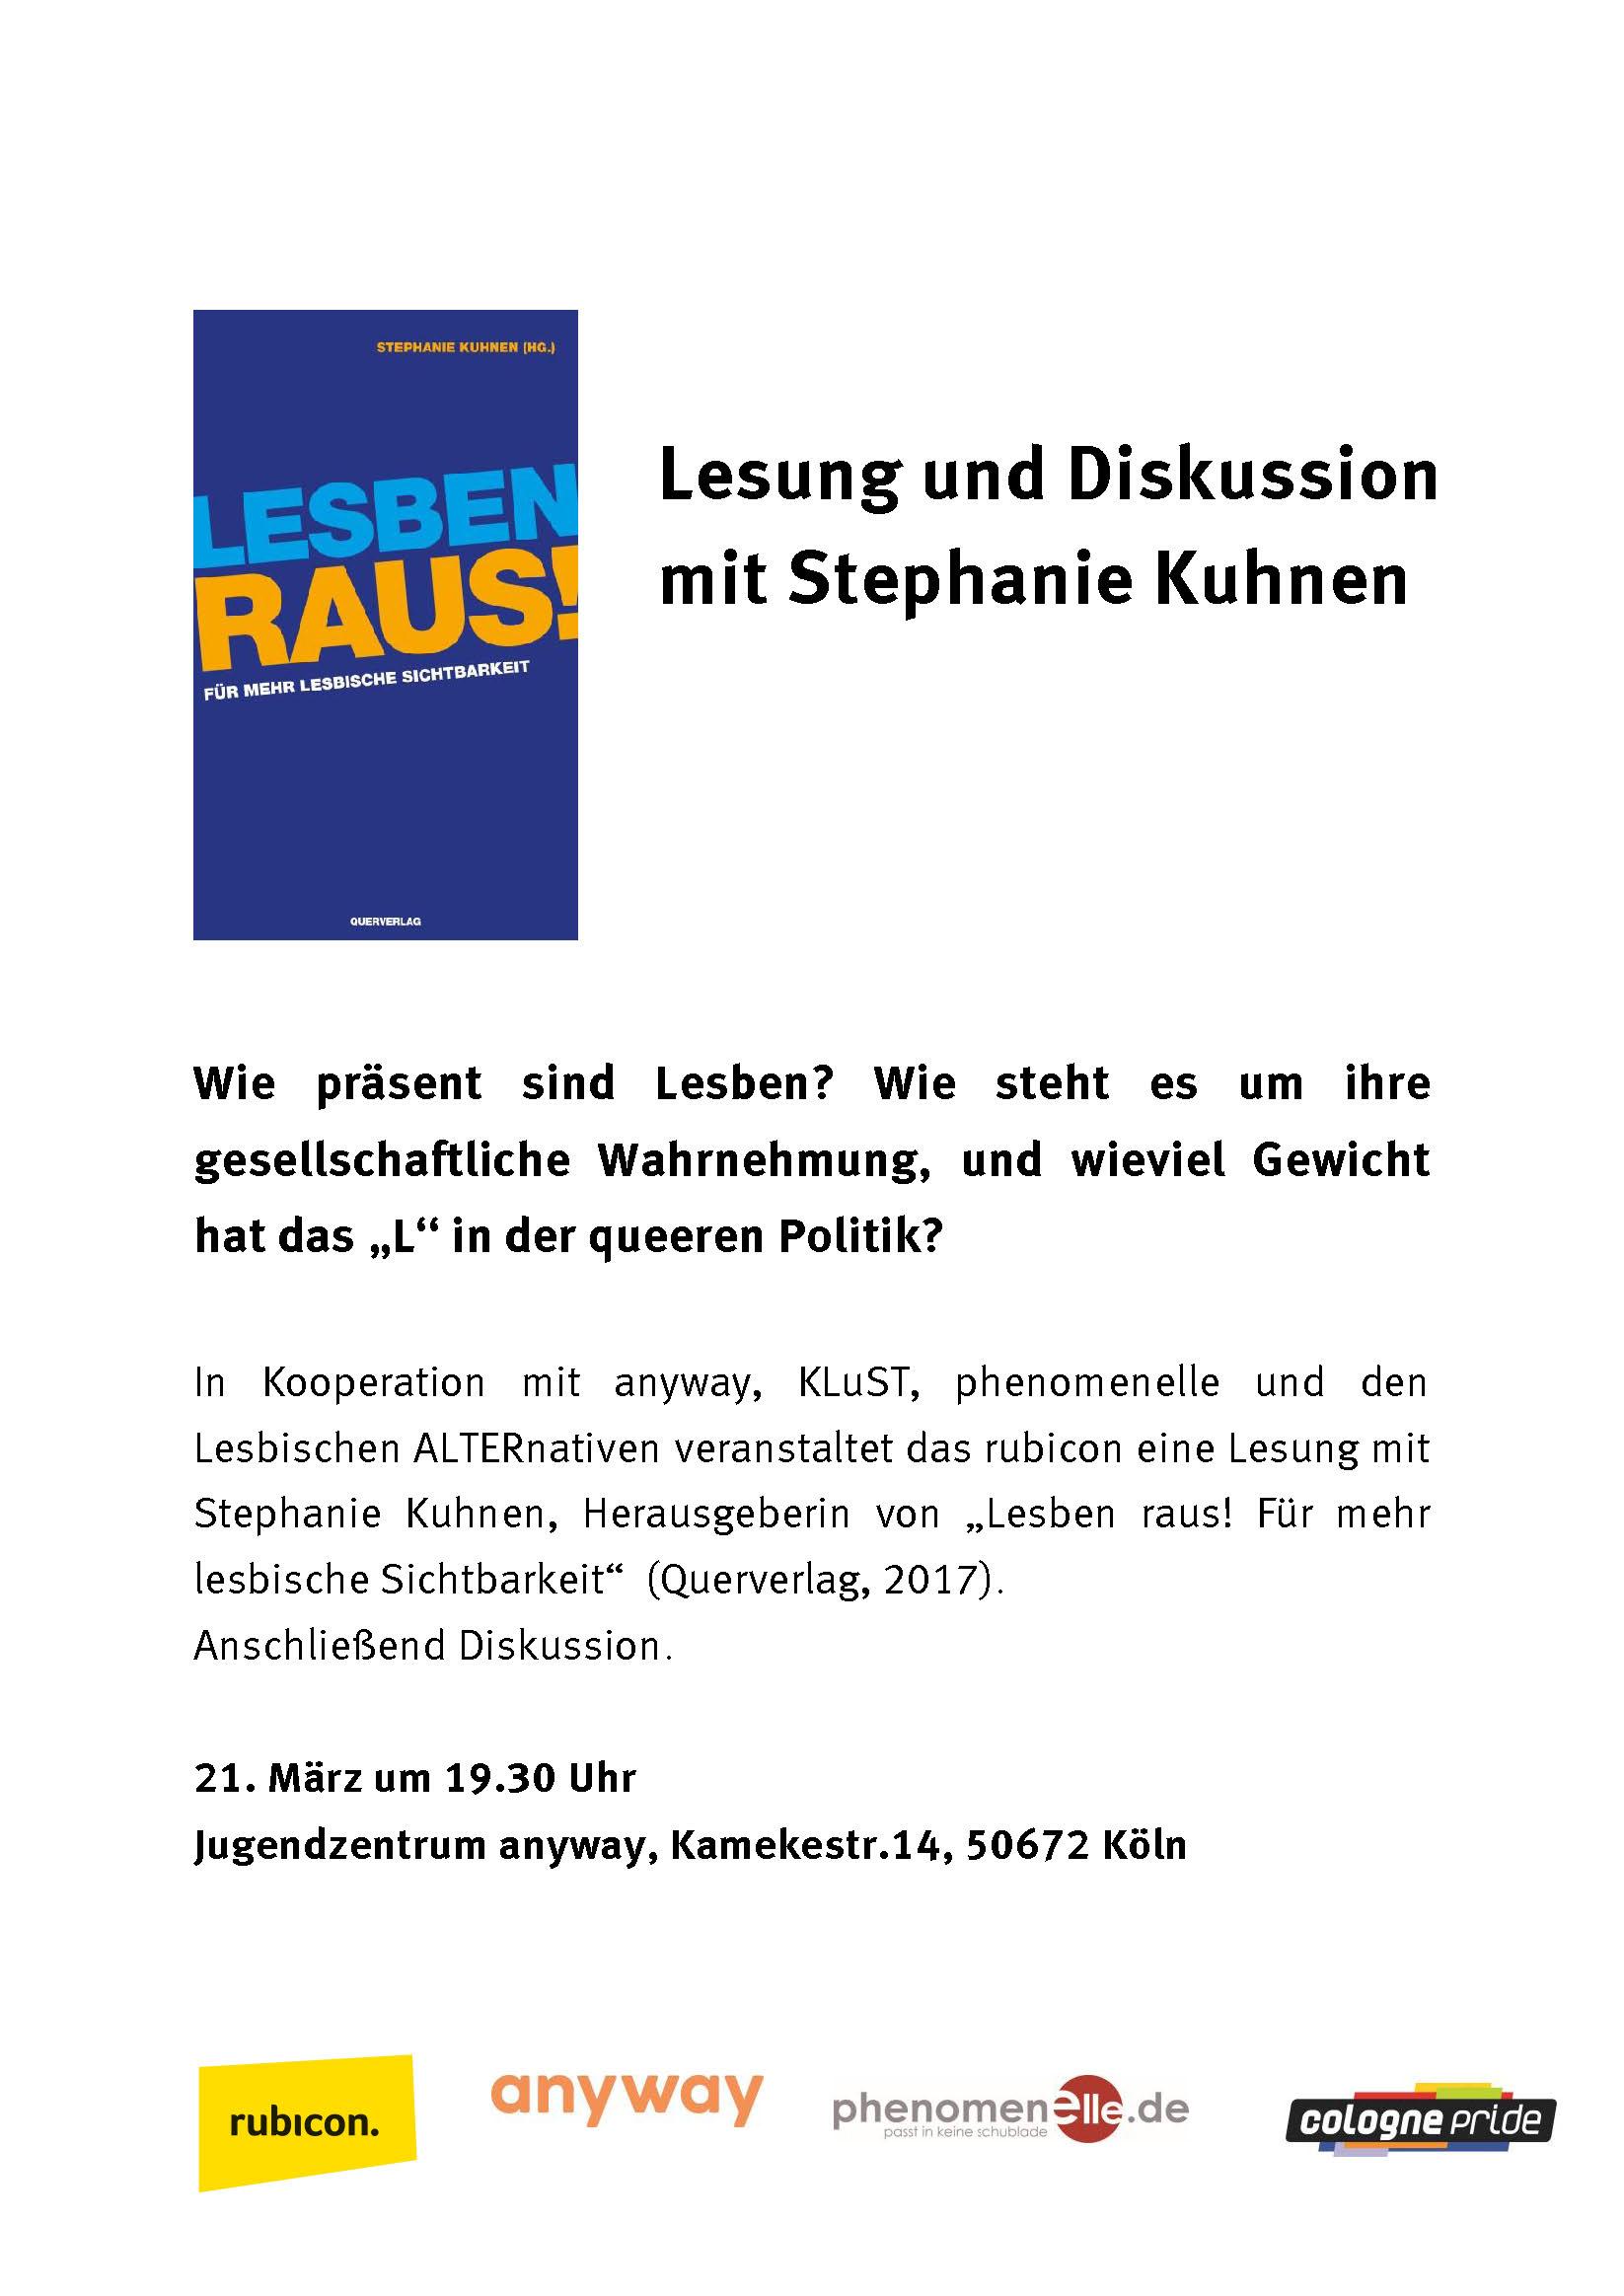 Lesben raus in Köln